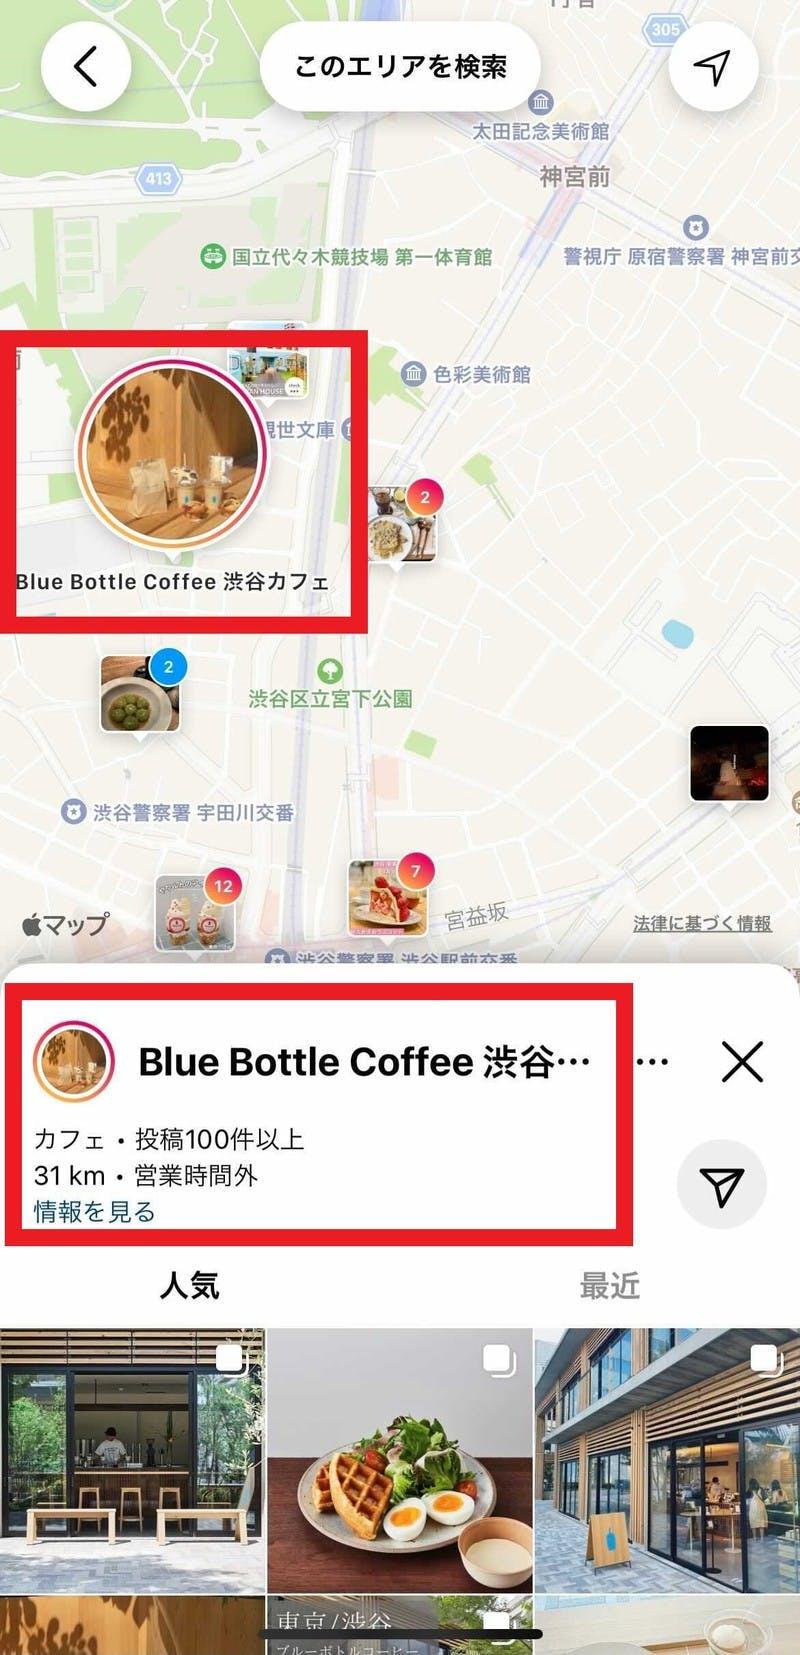 Instagramの地図検索ページで表示される店舗情報